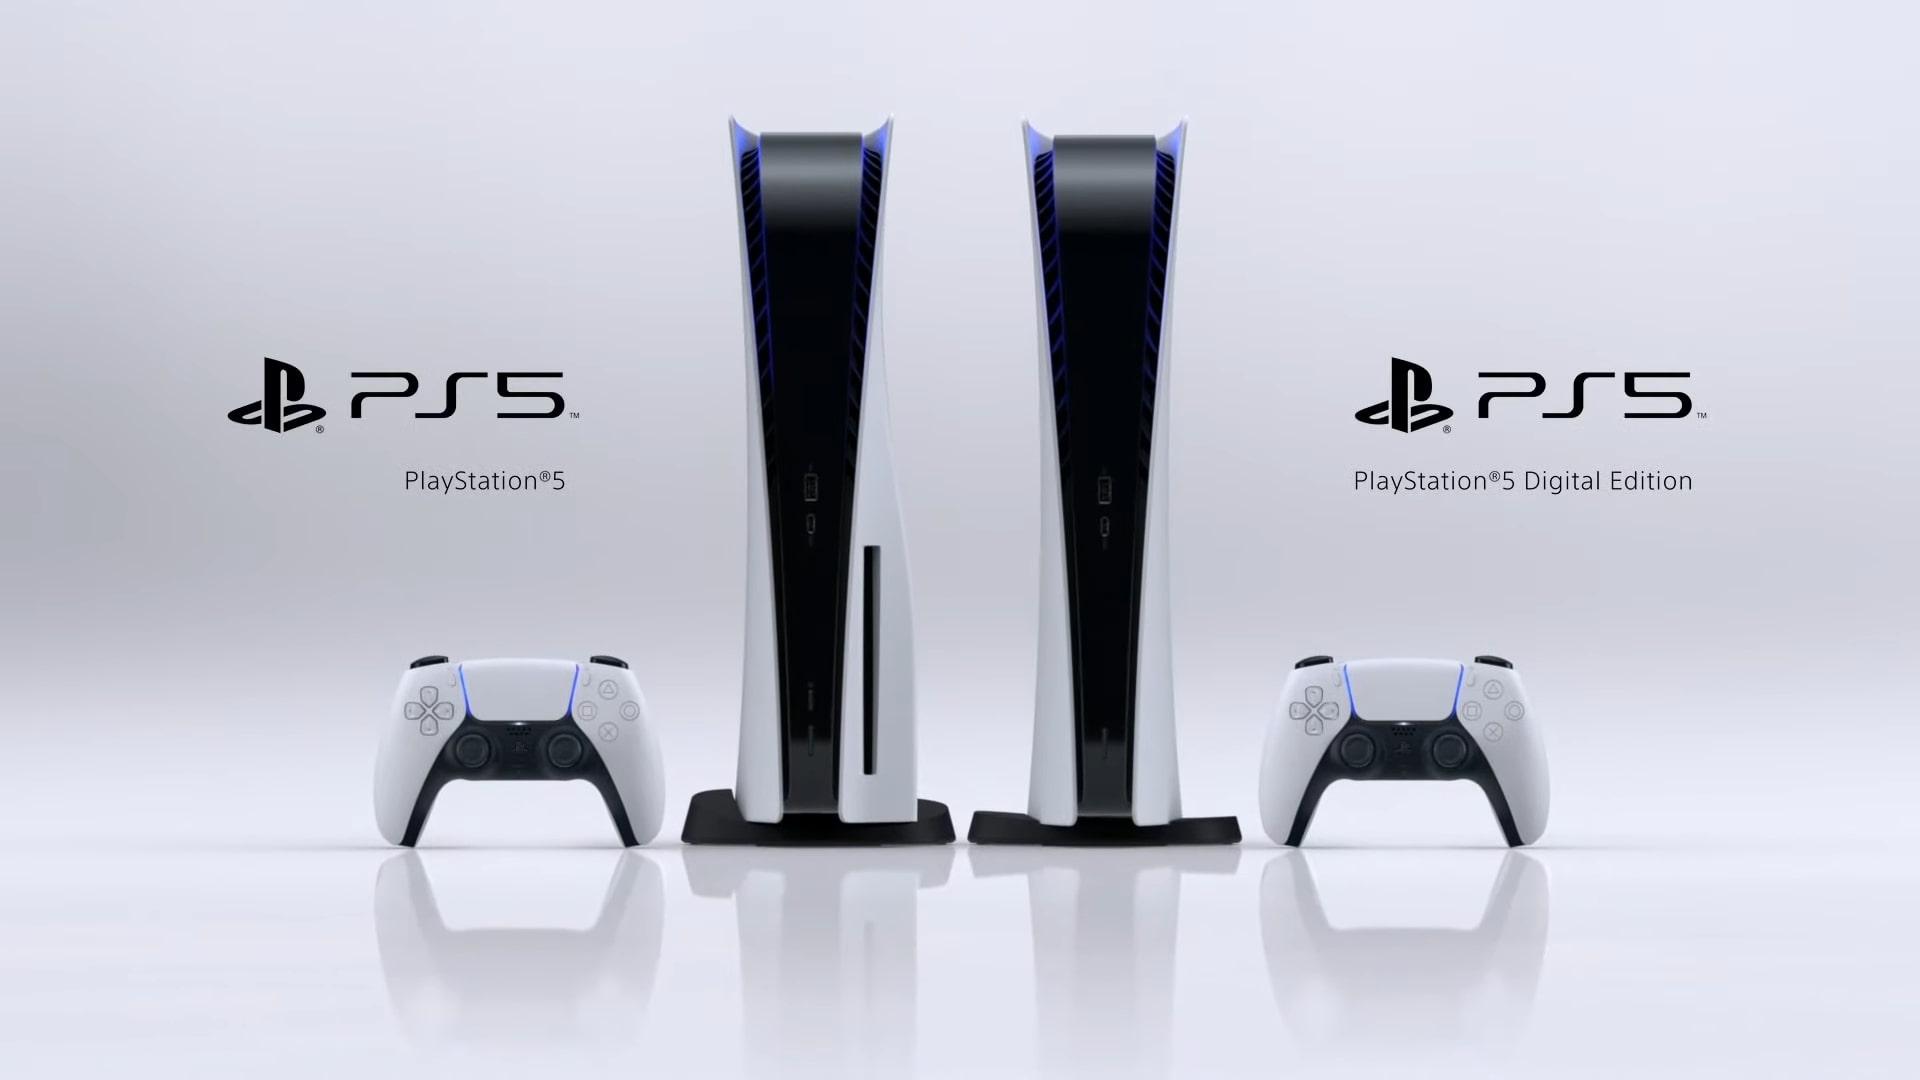 upgrade PS5 internal storage